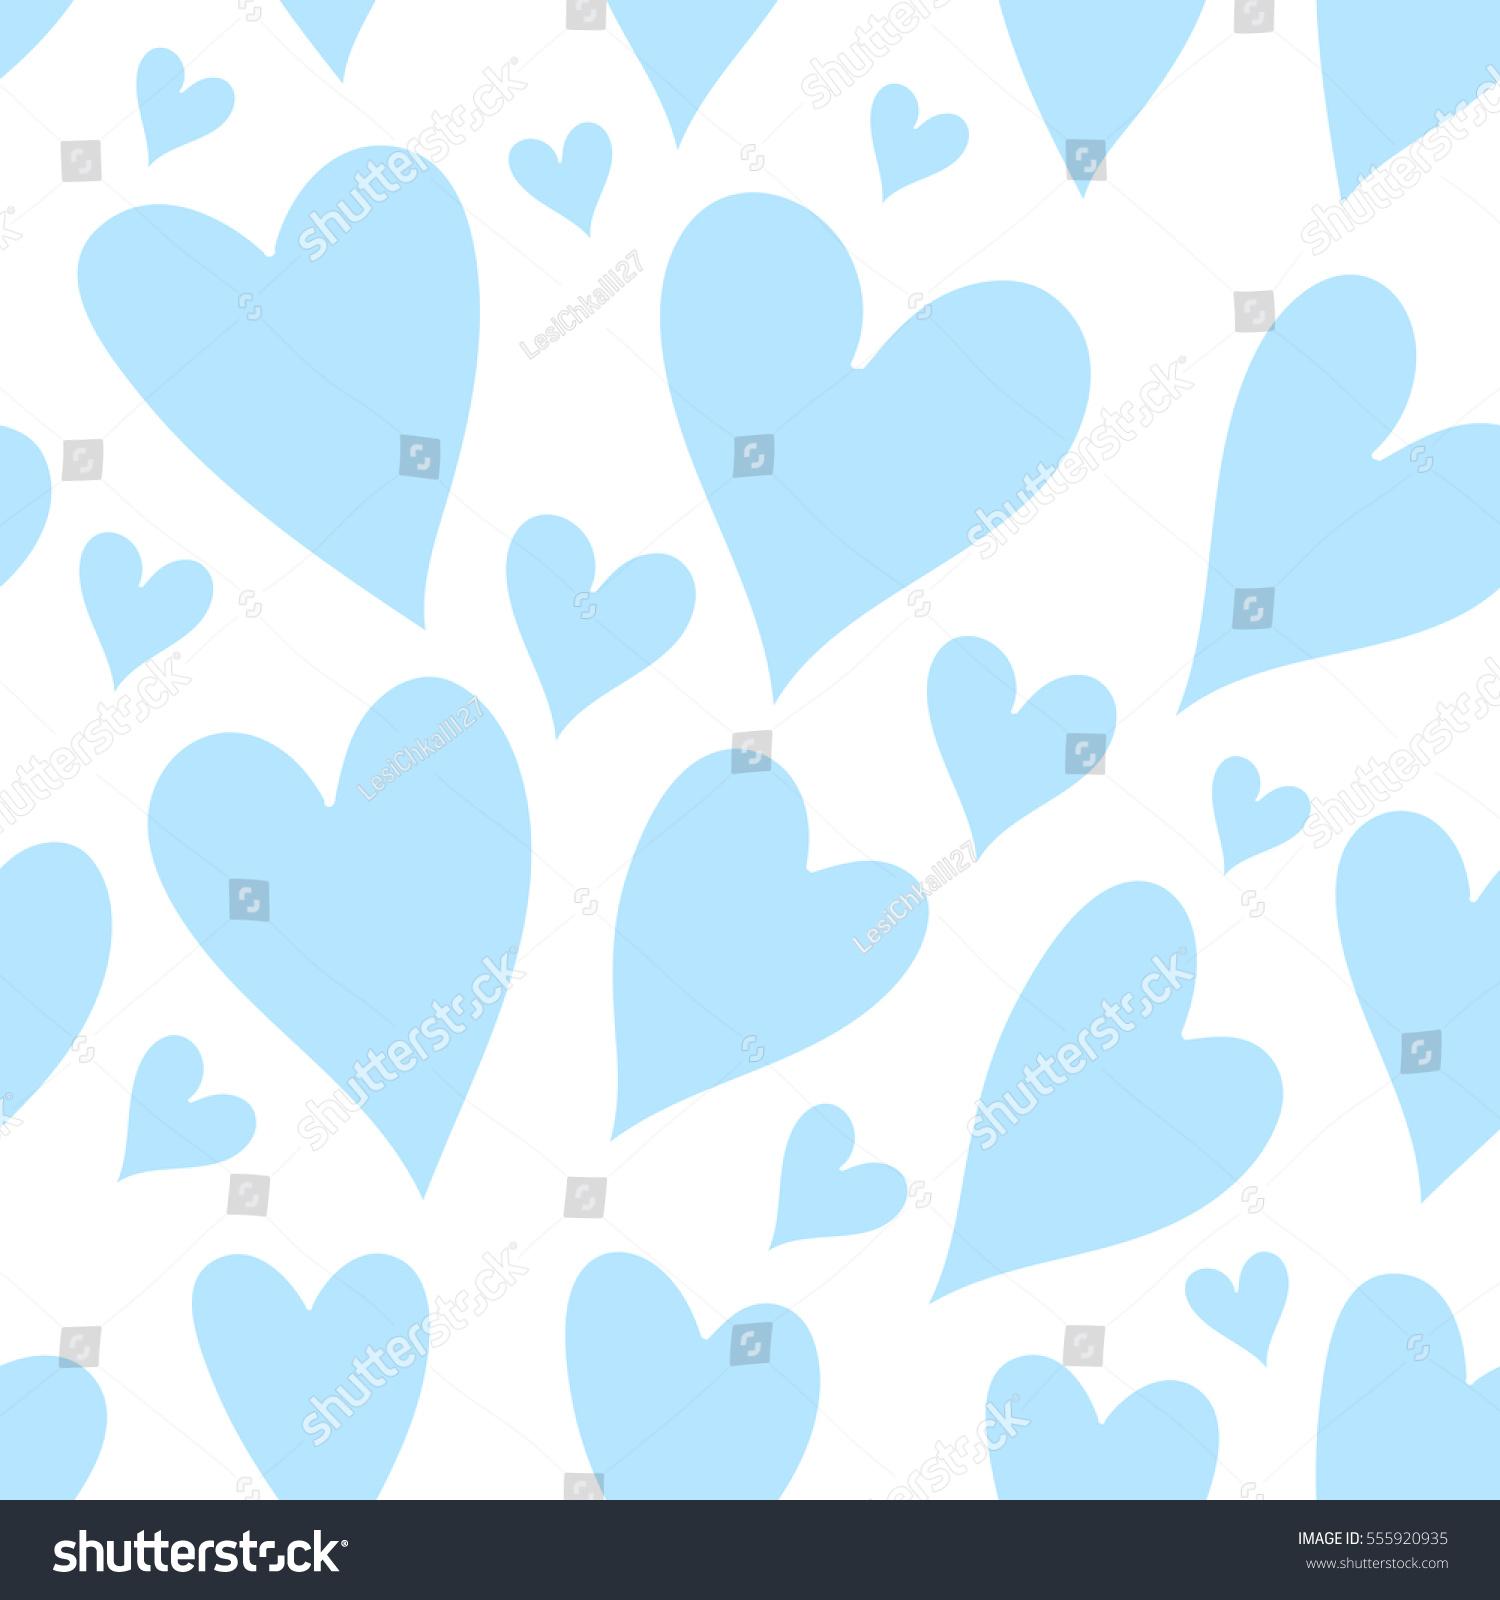 light blue heart background - photo #39